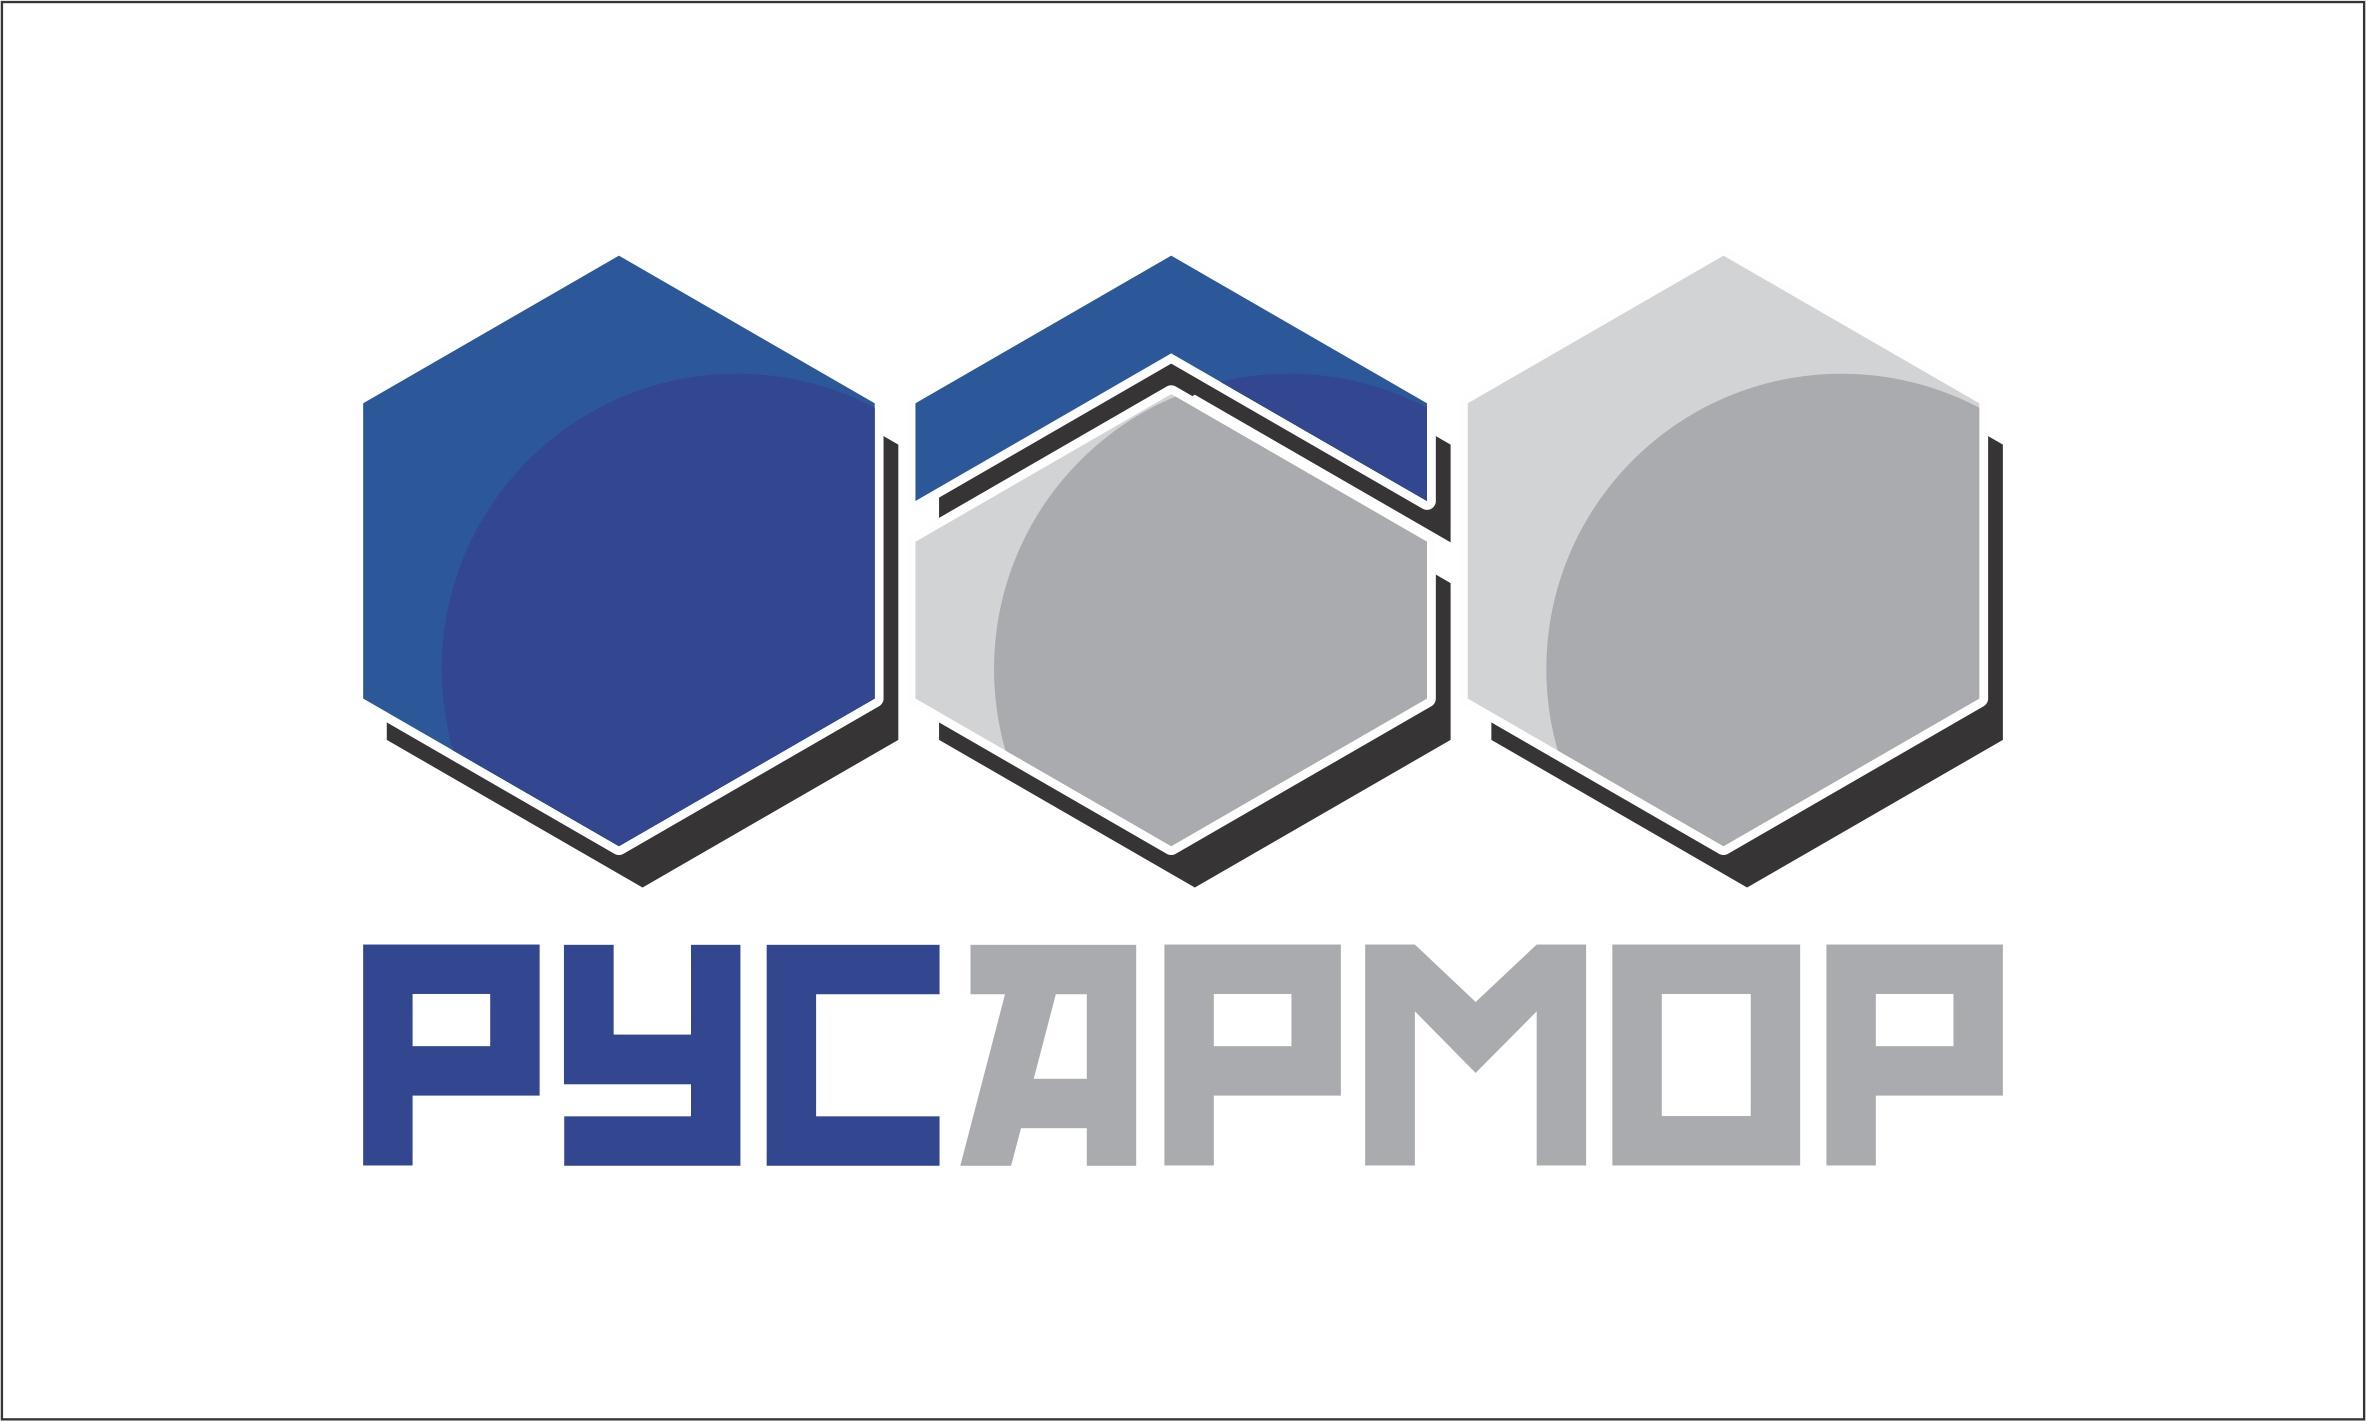 Разработка логотипа технологического стартапа РУСАРМОР фото f_7395a0b7cb5b7dac.jpg